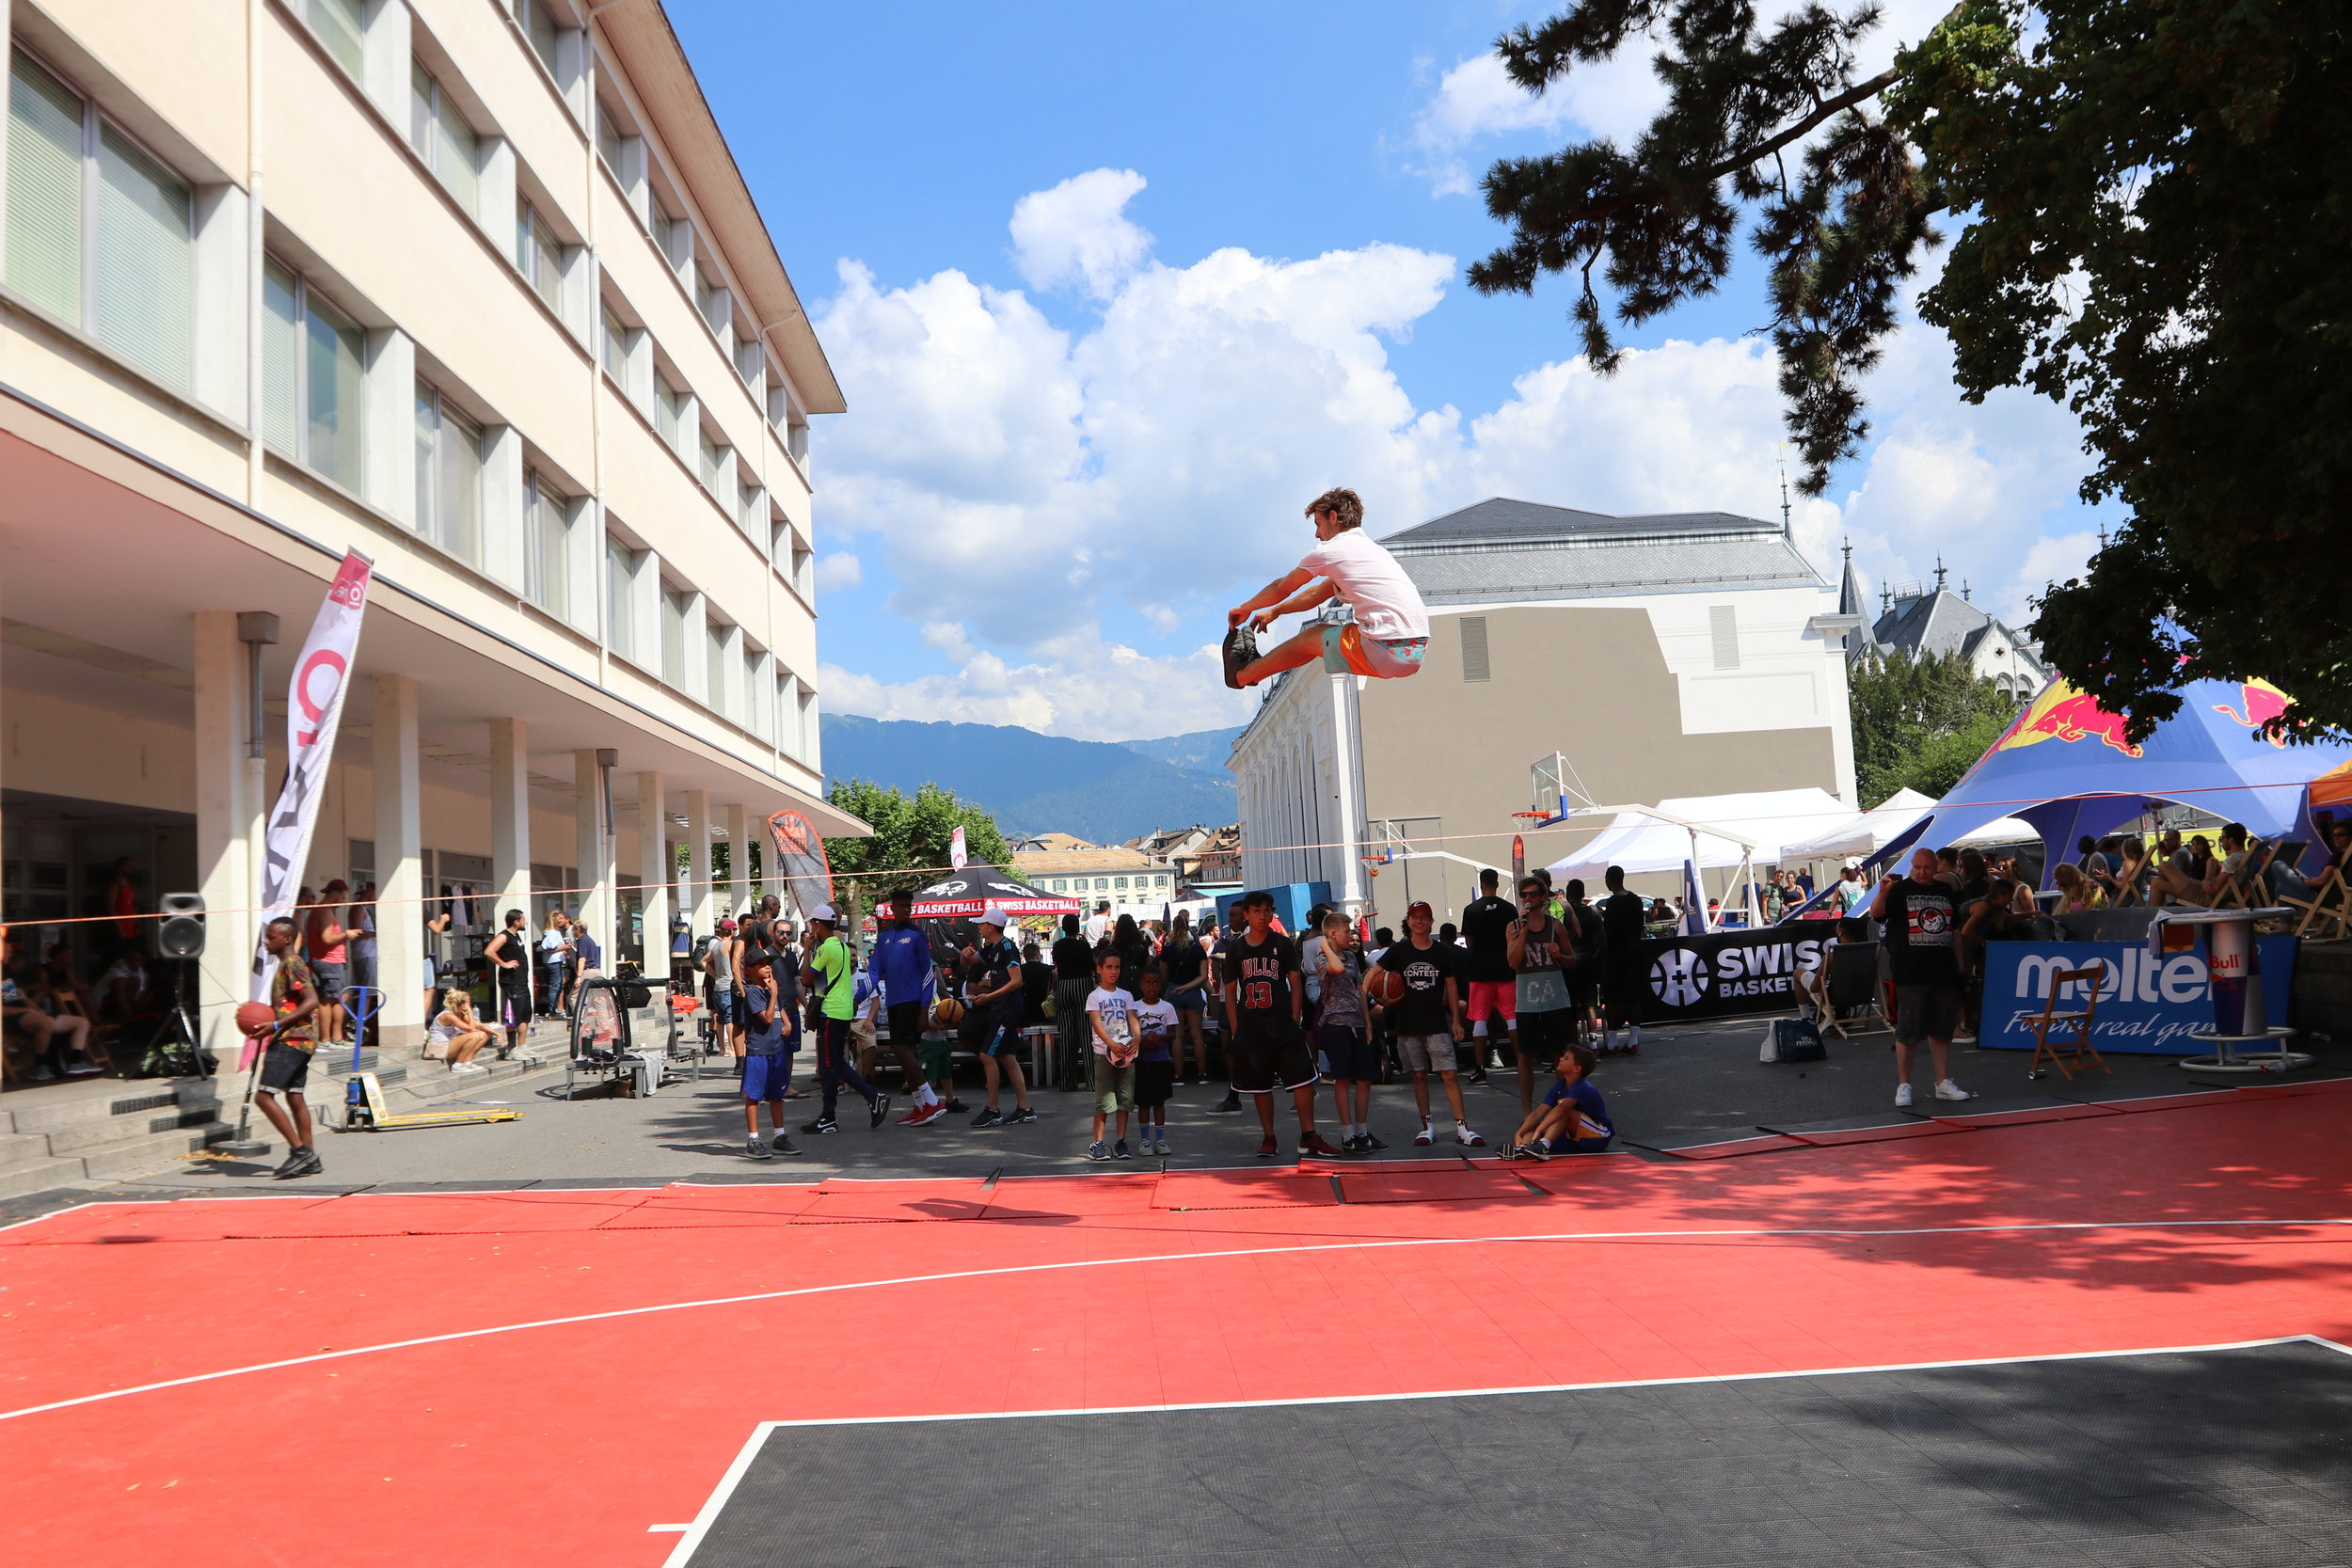 Urban project vevey highline trickline show funambule circus performance spectacle ecole suisse Slackline Lyell Grunberg  (1).JPG